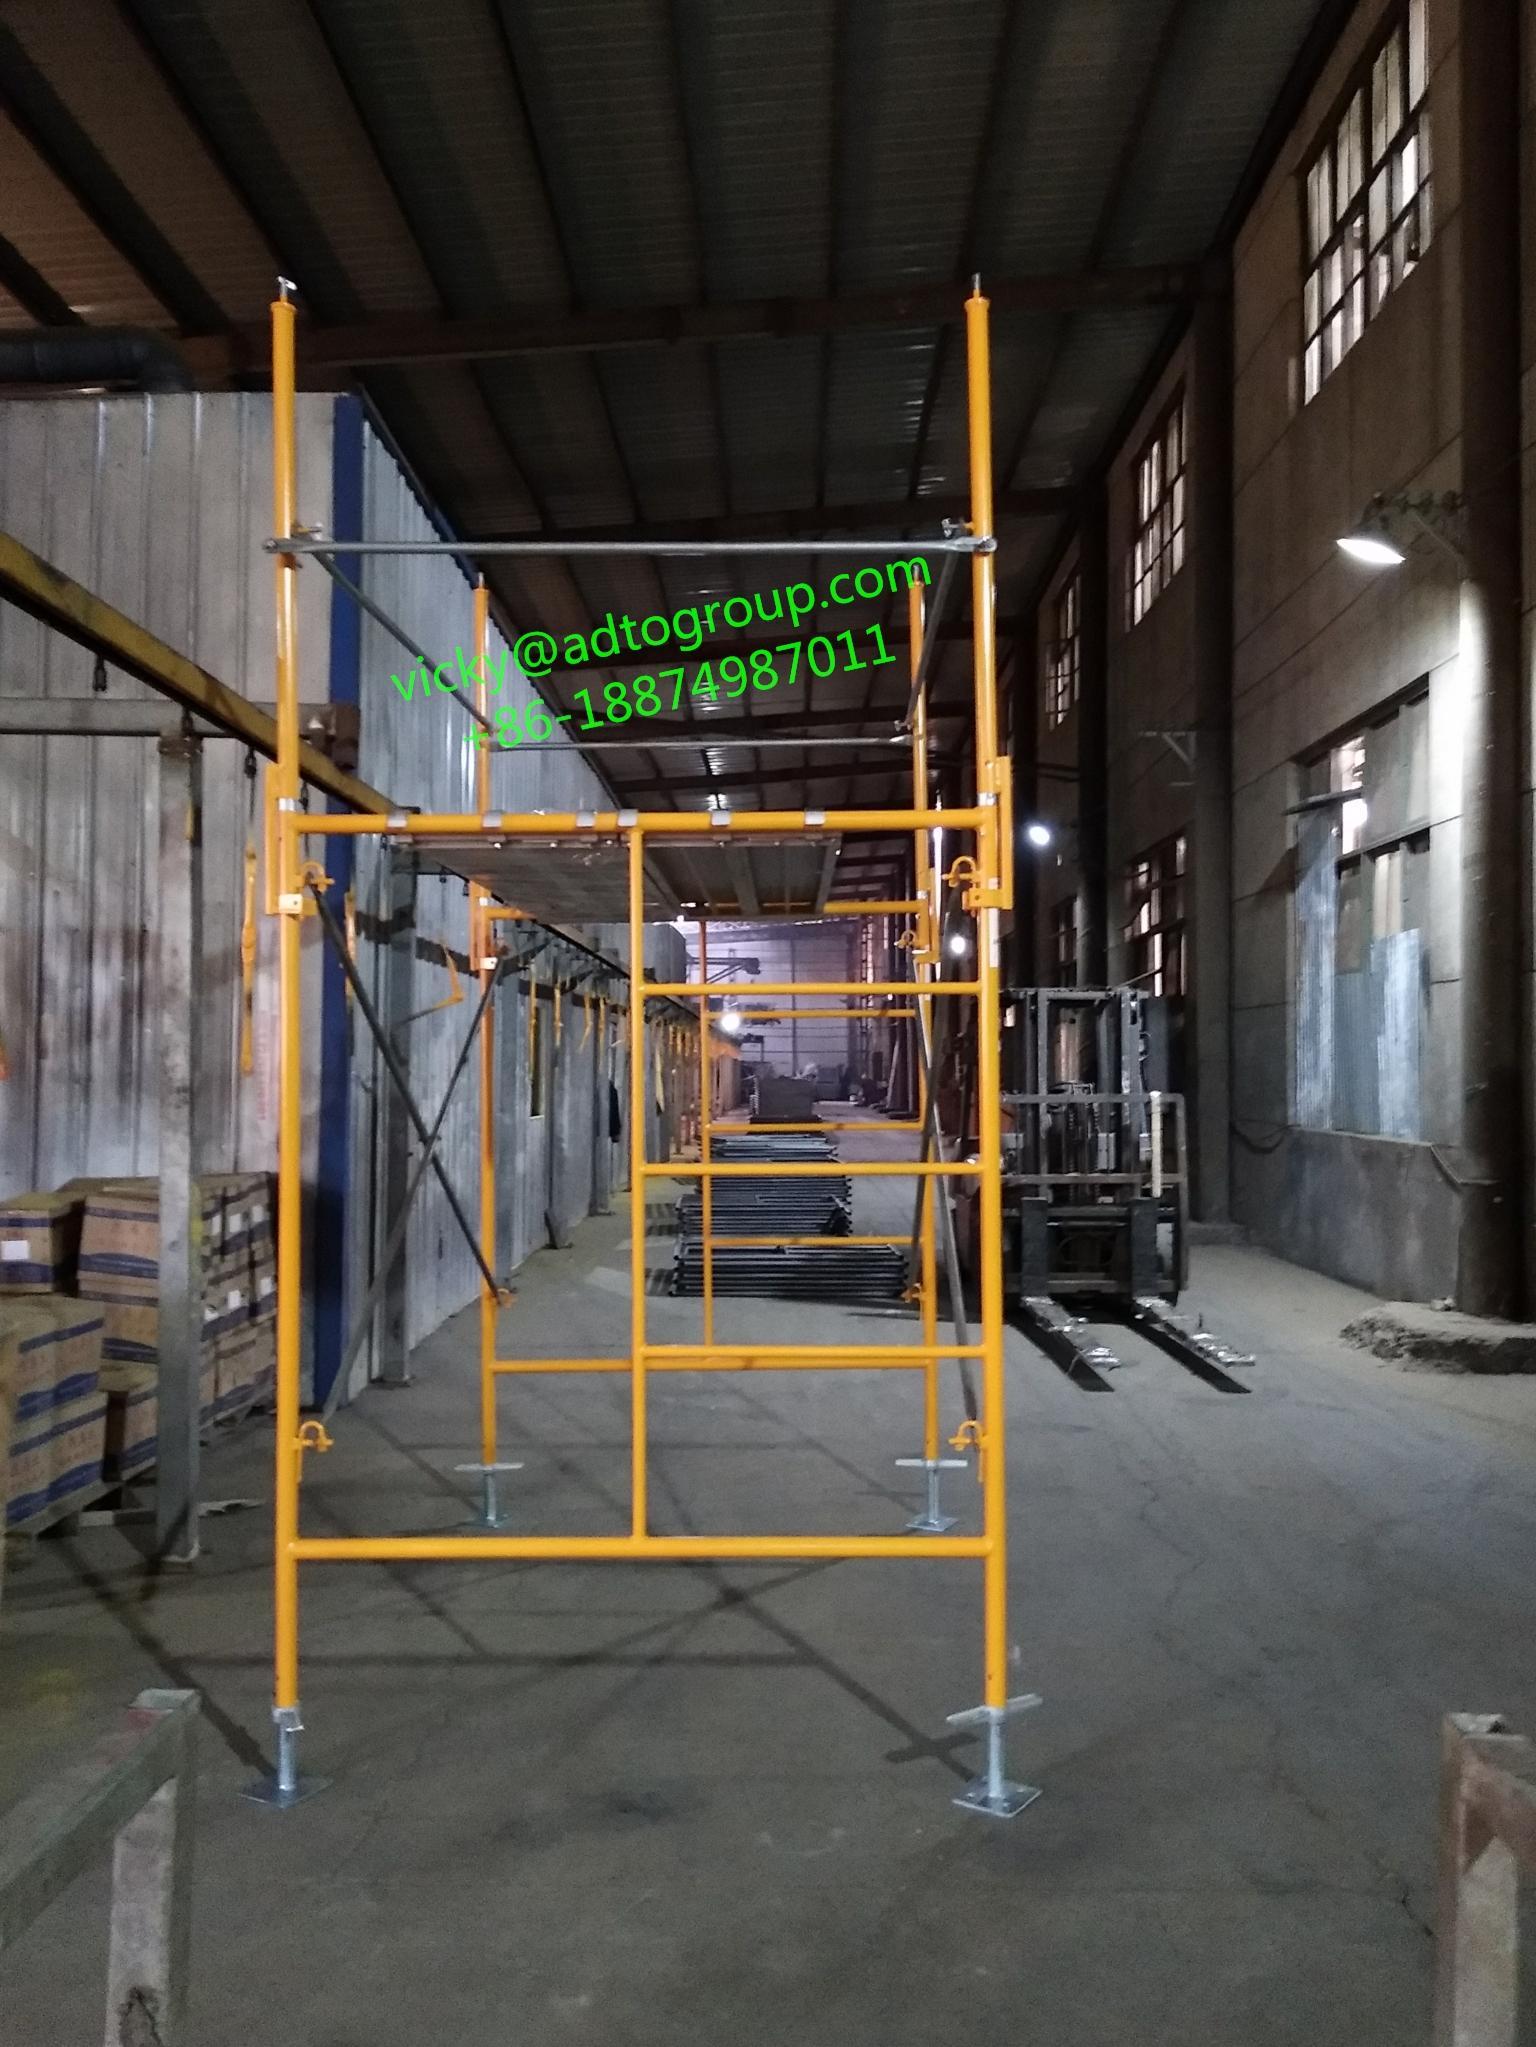 "42"" guardrail post guardrail post with kicker guardrail frame scaffold frame sca 4"